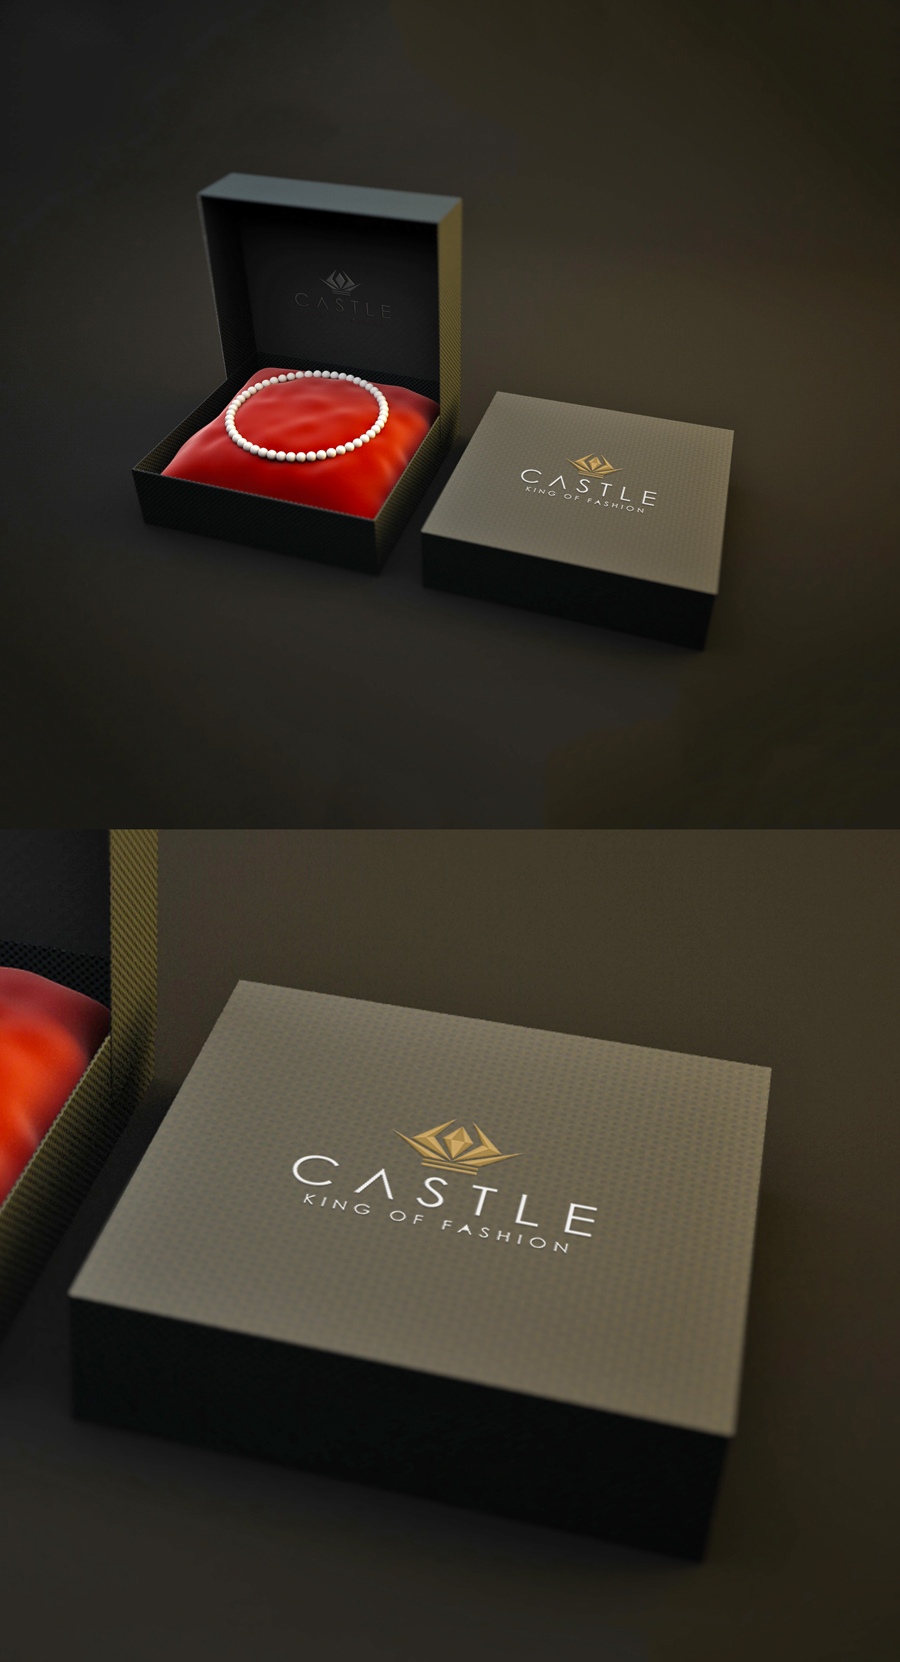 castle-jewelry-box1